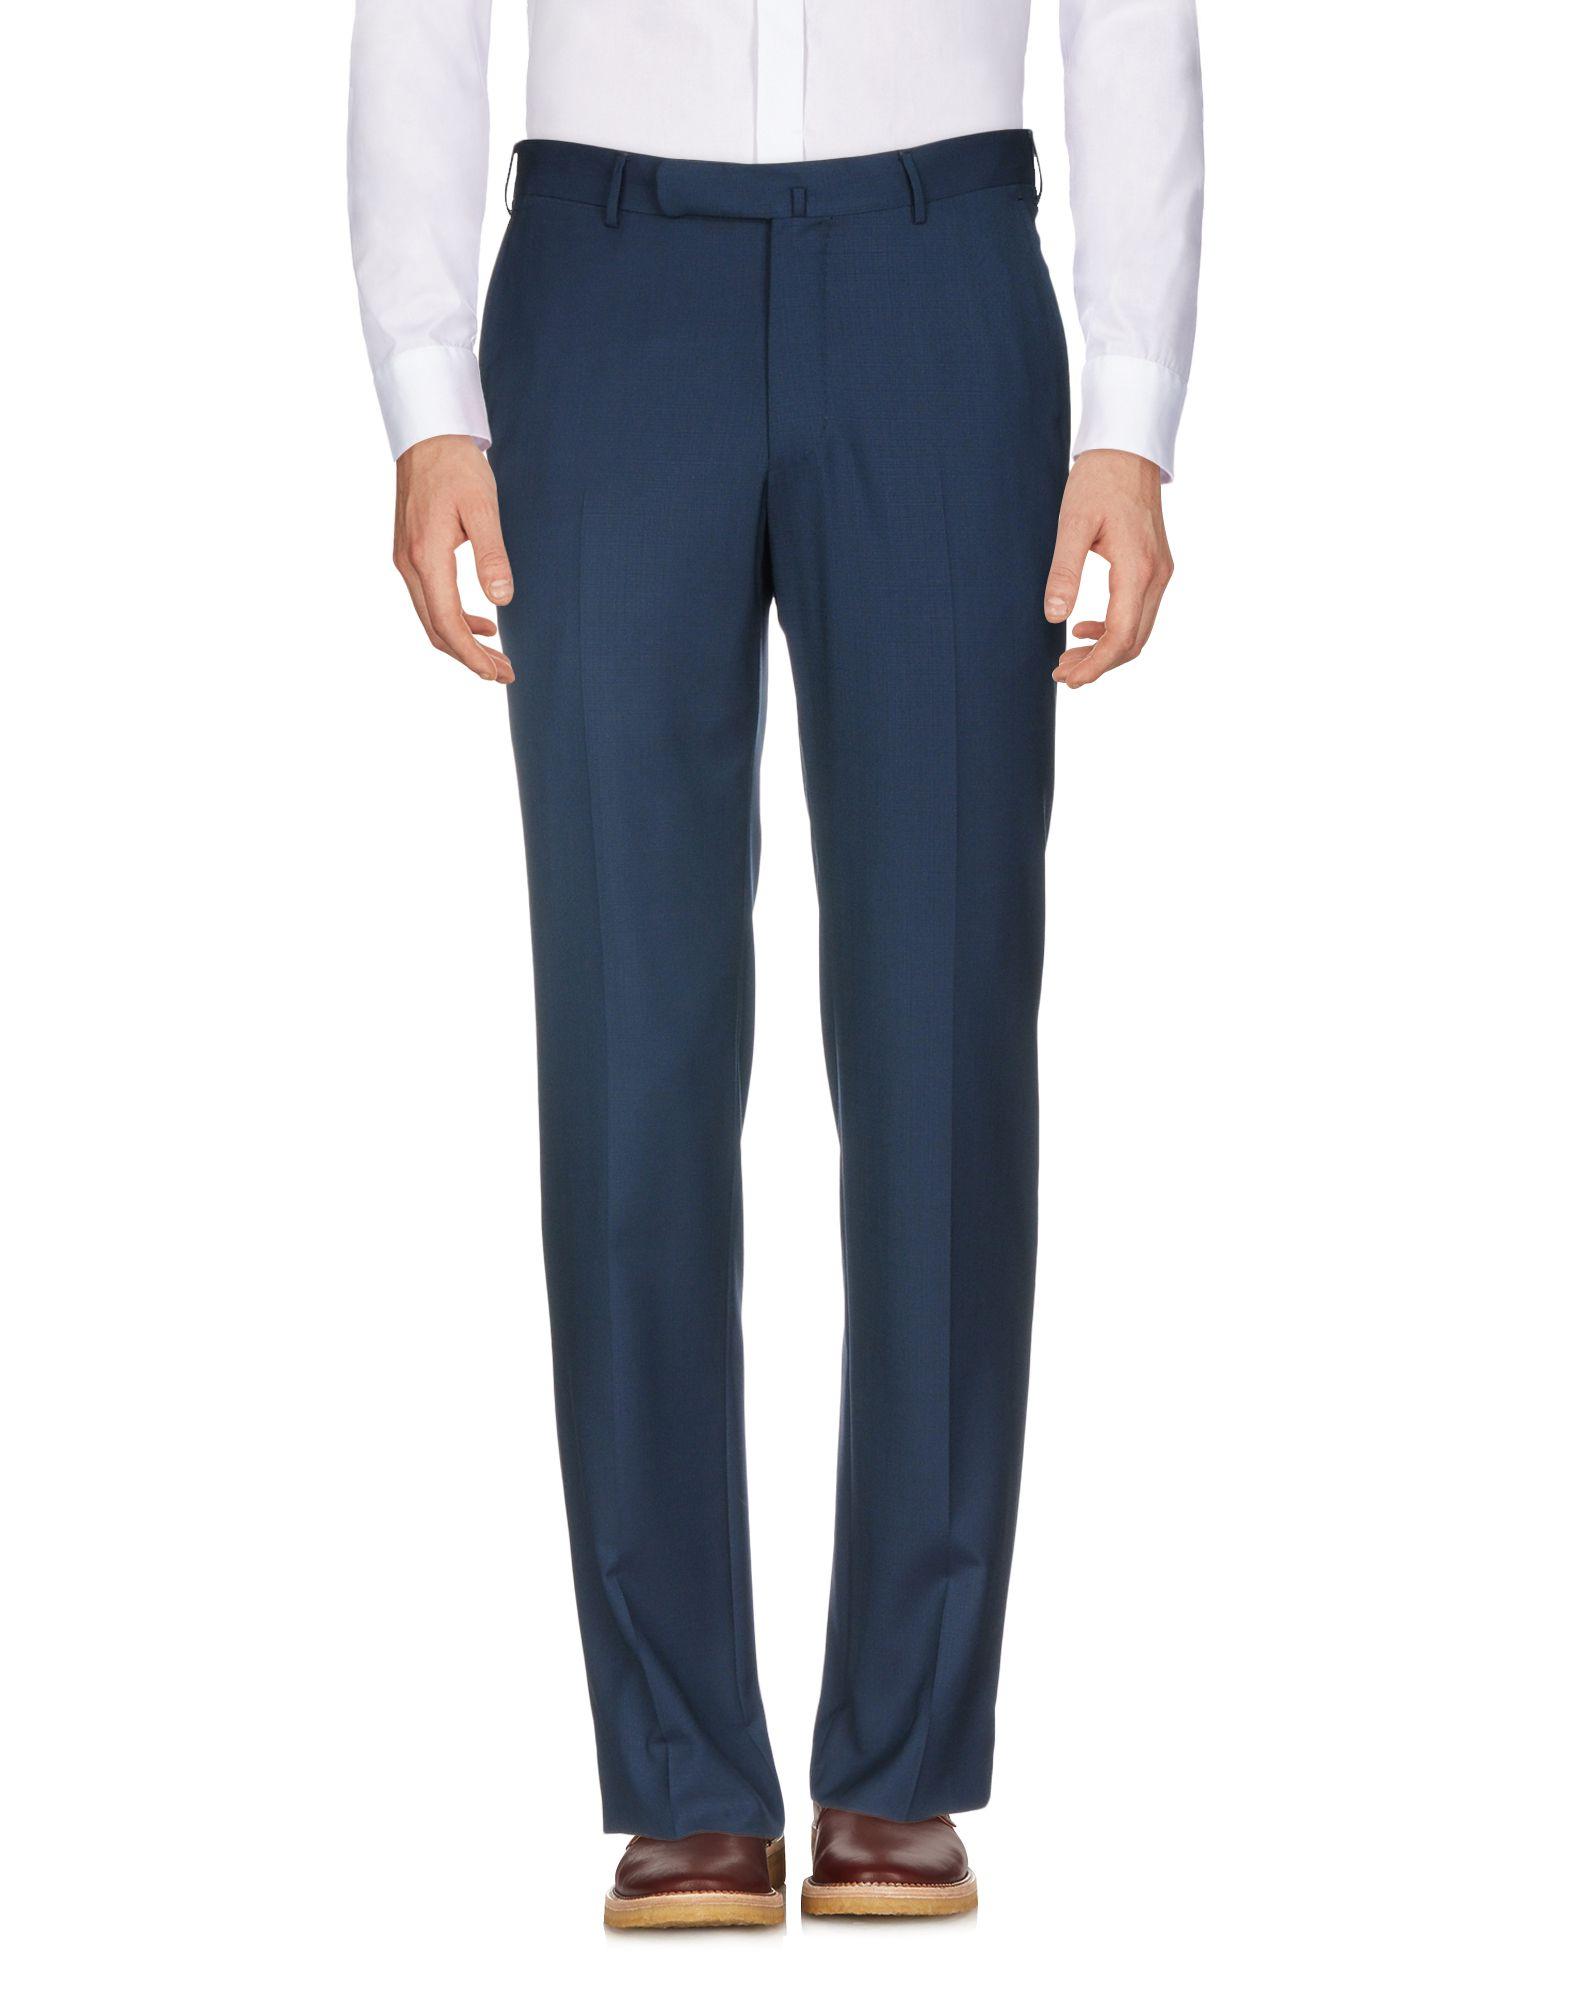 Pantalone Ermenegildo Zegna Uomo - Acquista online su